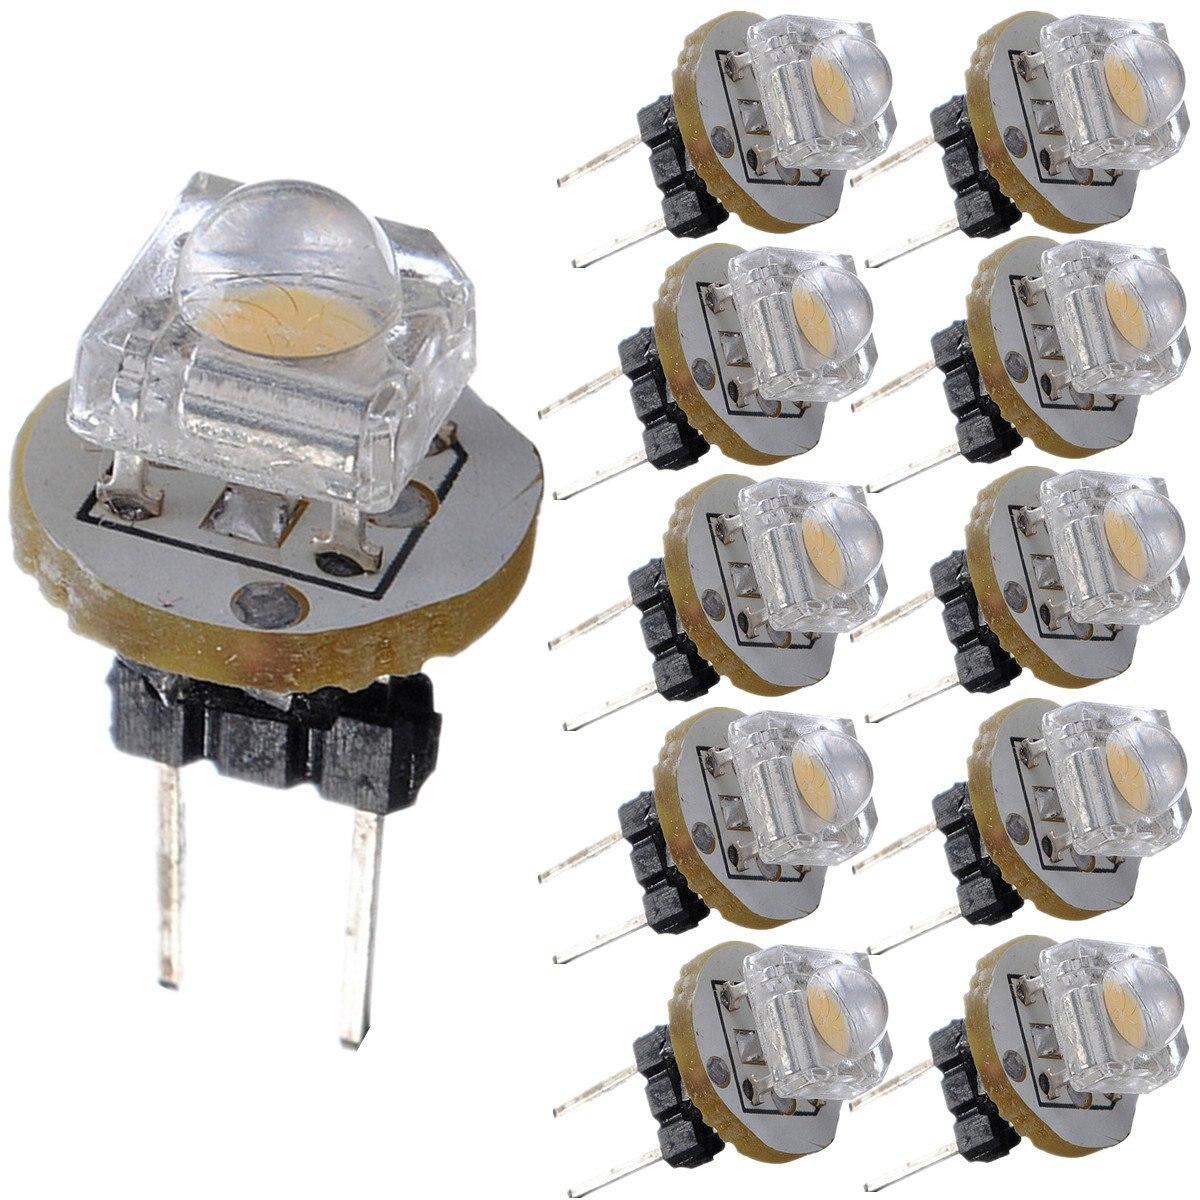 PB-Versand Transformateur LED 0,5-12 W 12 V DC G4 GU4 MR16 MR11 Format rond